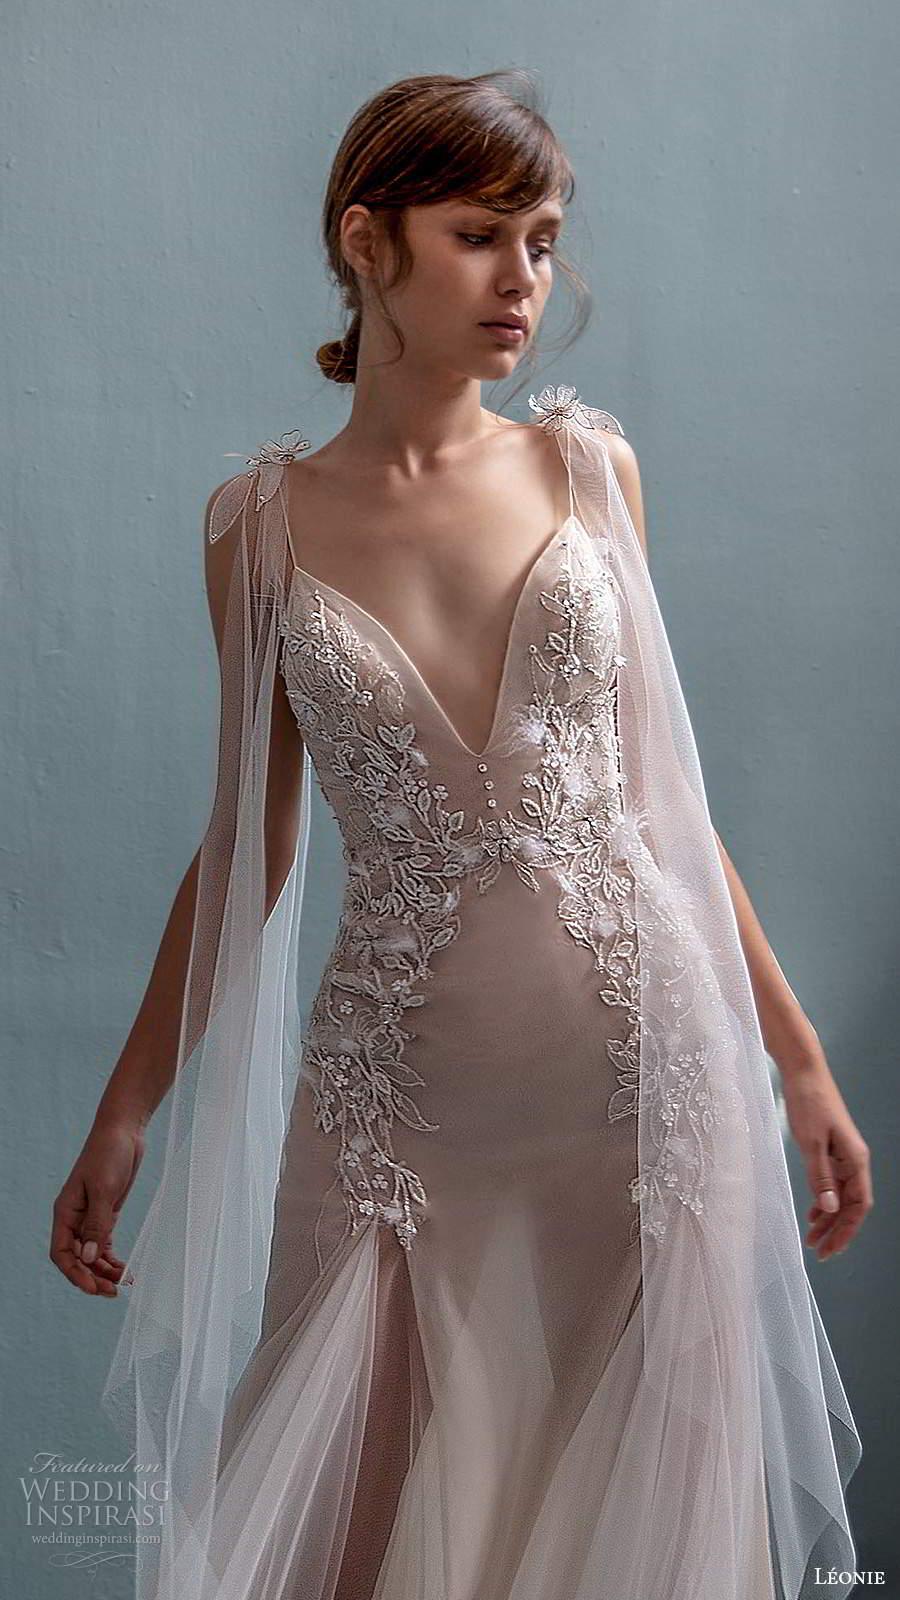 leonie bridal 2020 bridal sleeveless ribbon tie straps plunginv neckline embellished bodice fit flare a line wedding dress chapel train (7) zv